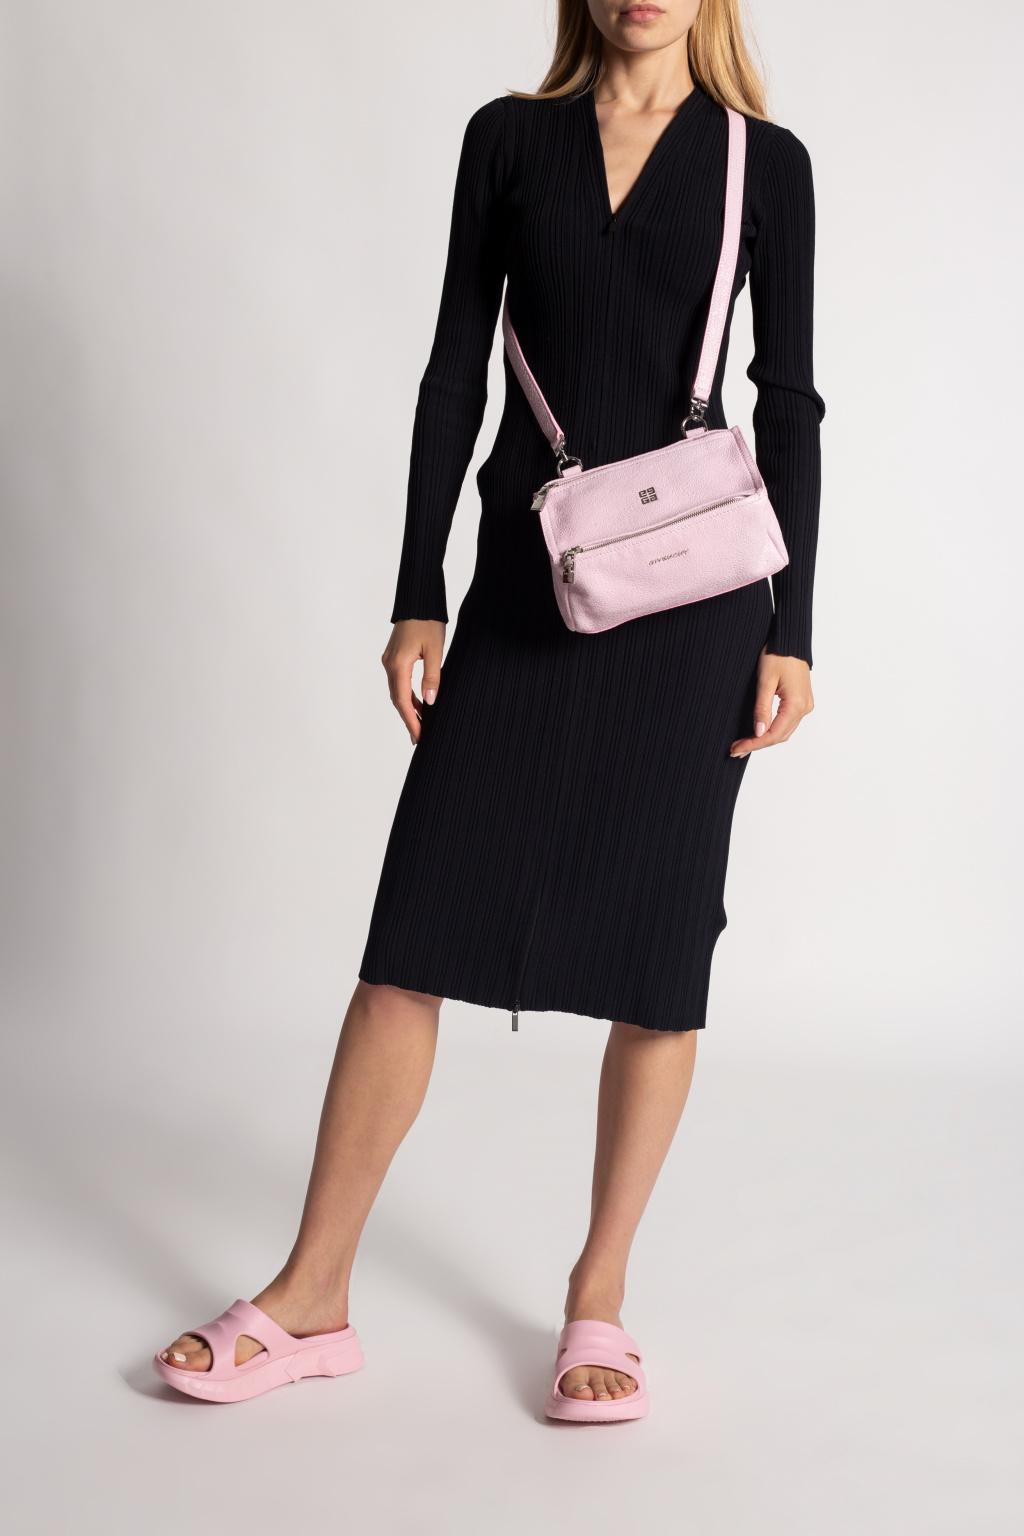 Givenchy Klapki na platformie 'Marshmallow'